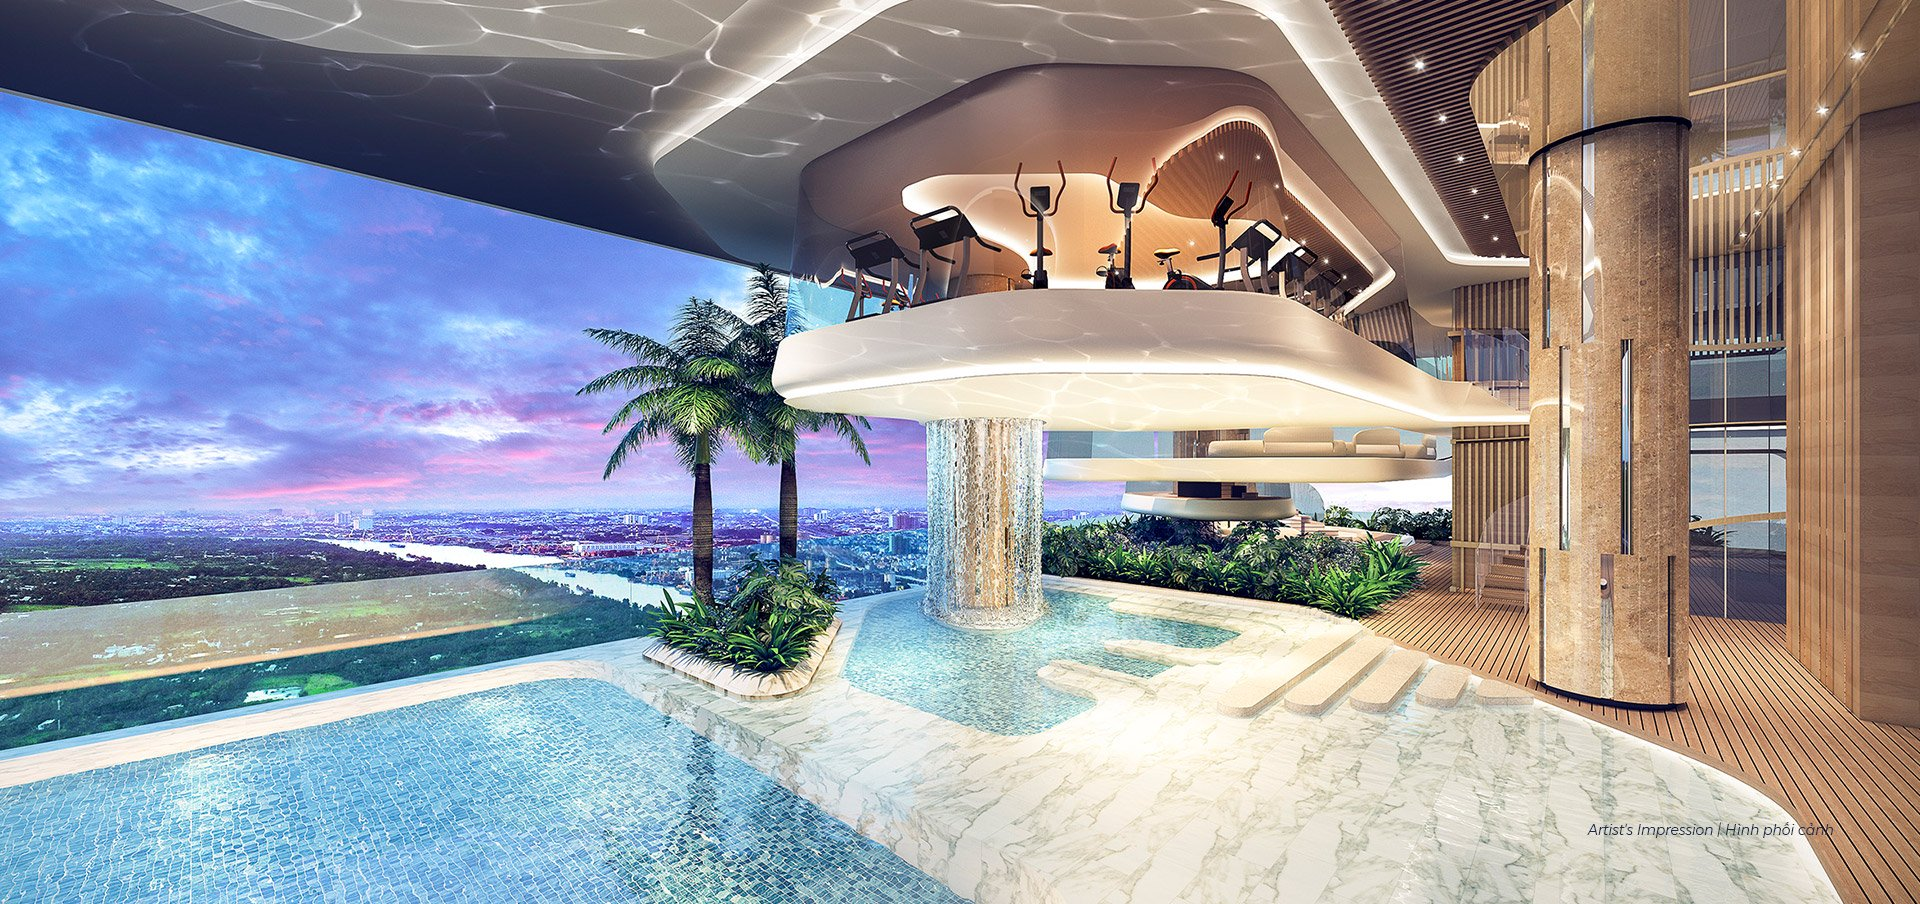 360-image-CGI-perspective-swimming pool